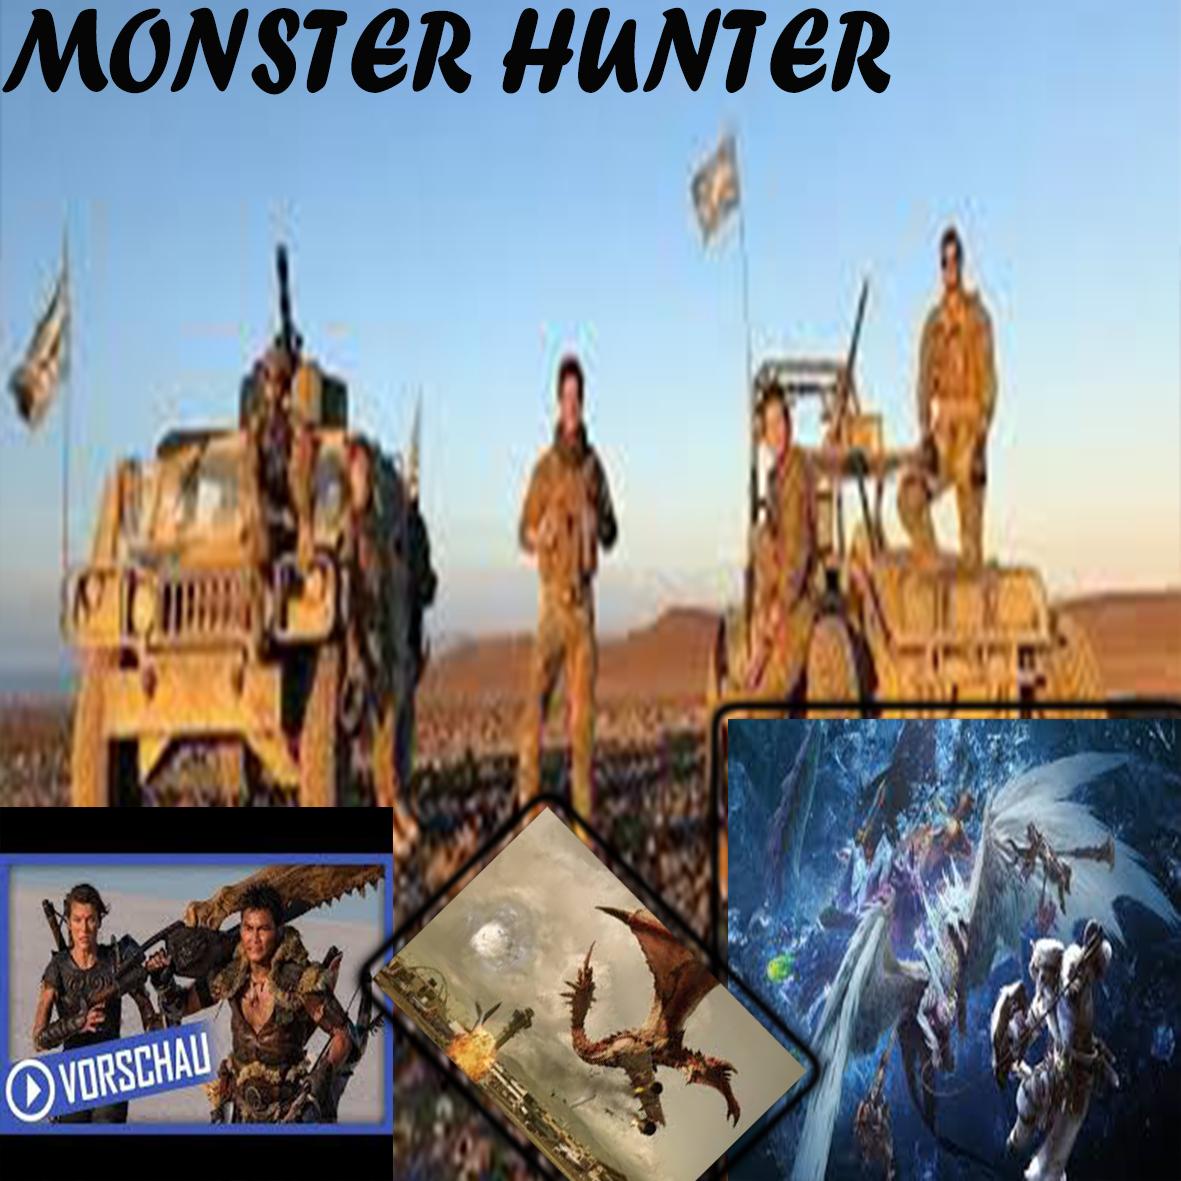 Monster Hunter 2020 In 2020 Monster Hunter Movies Hunter